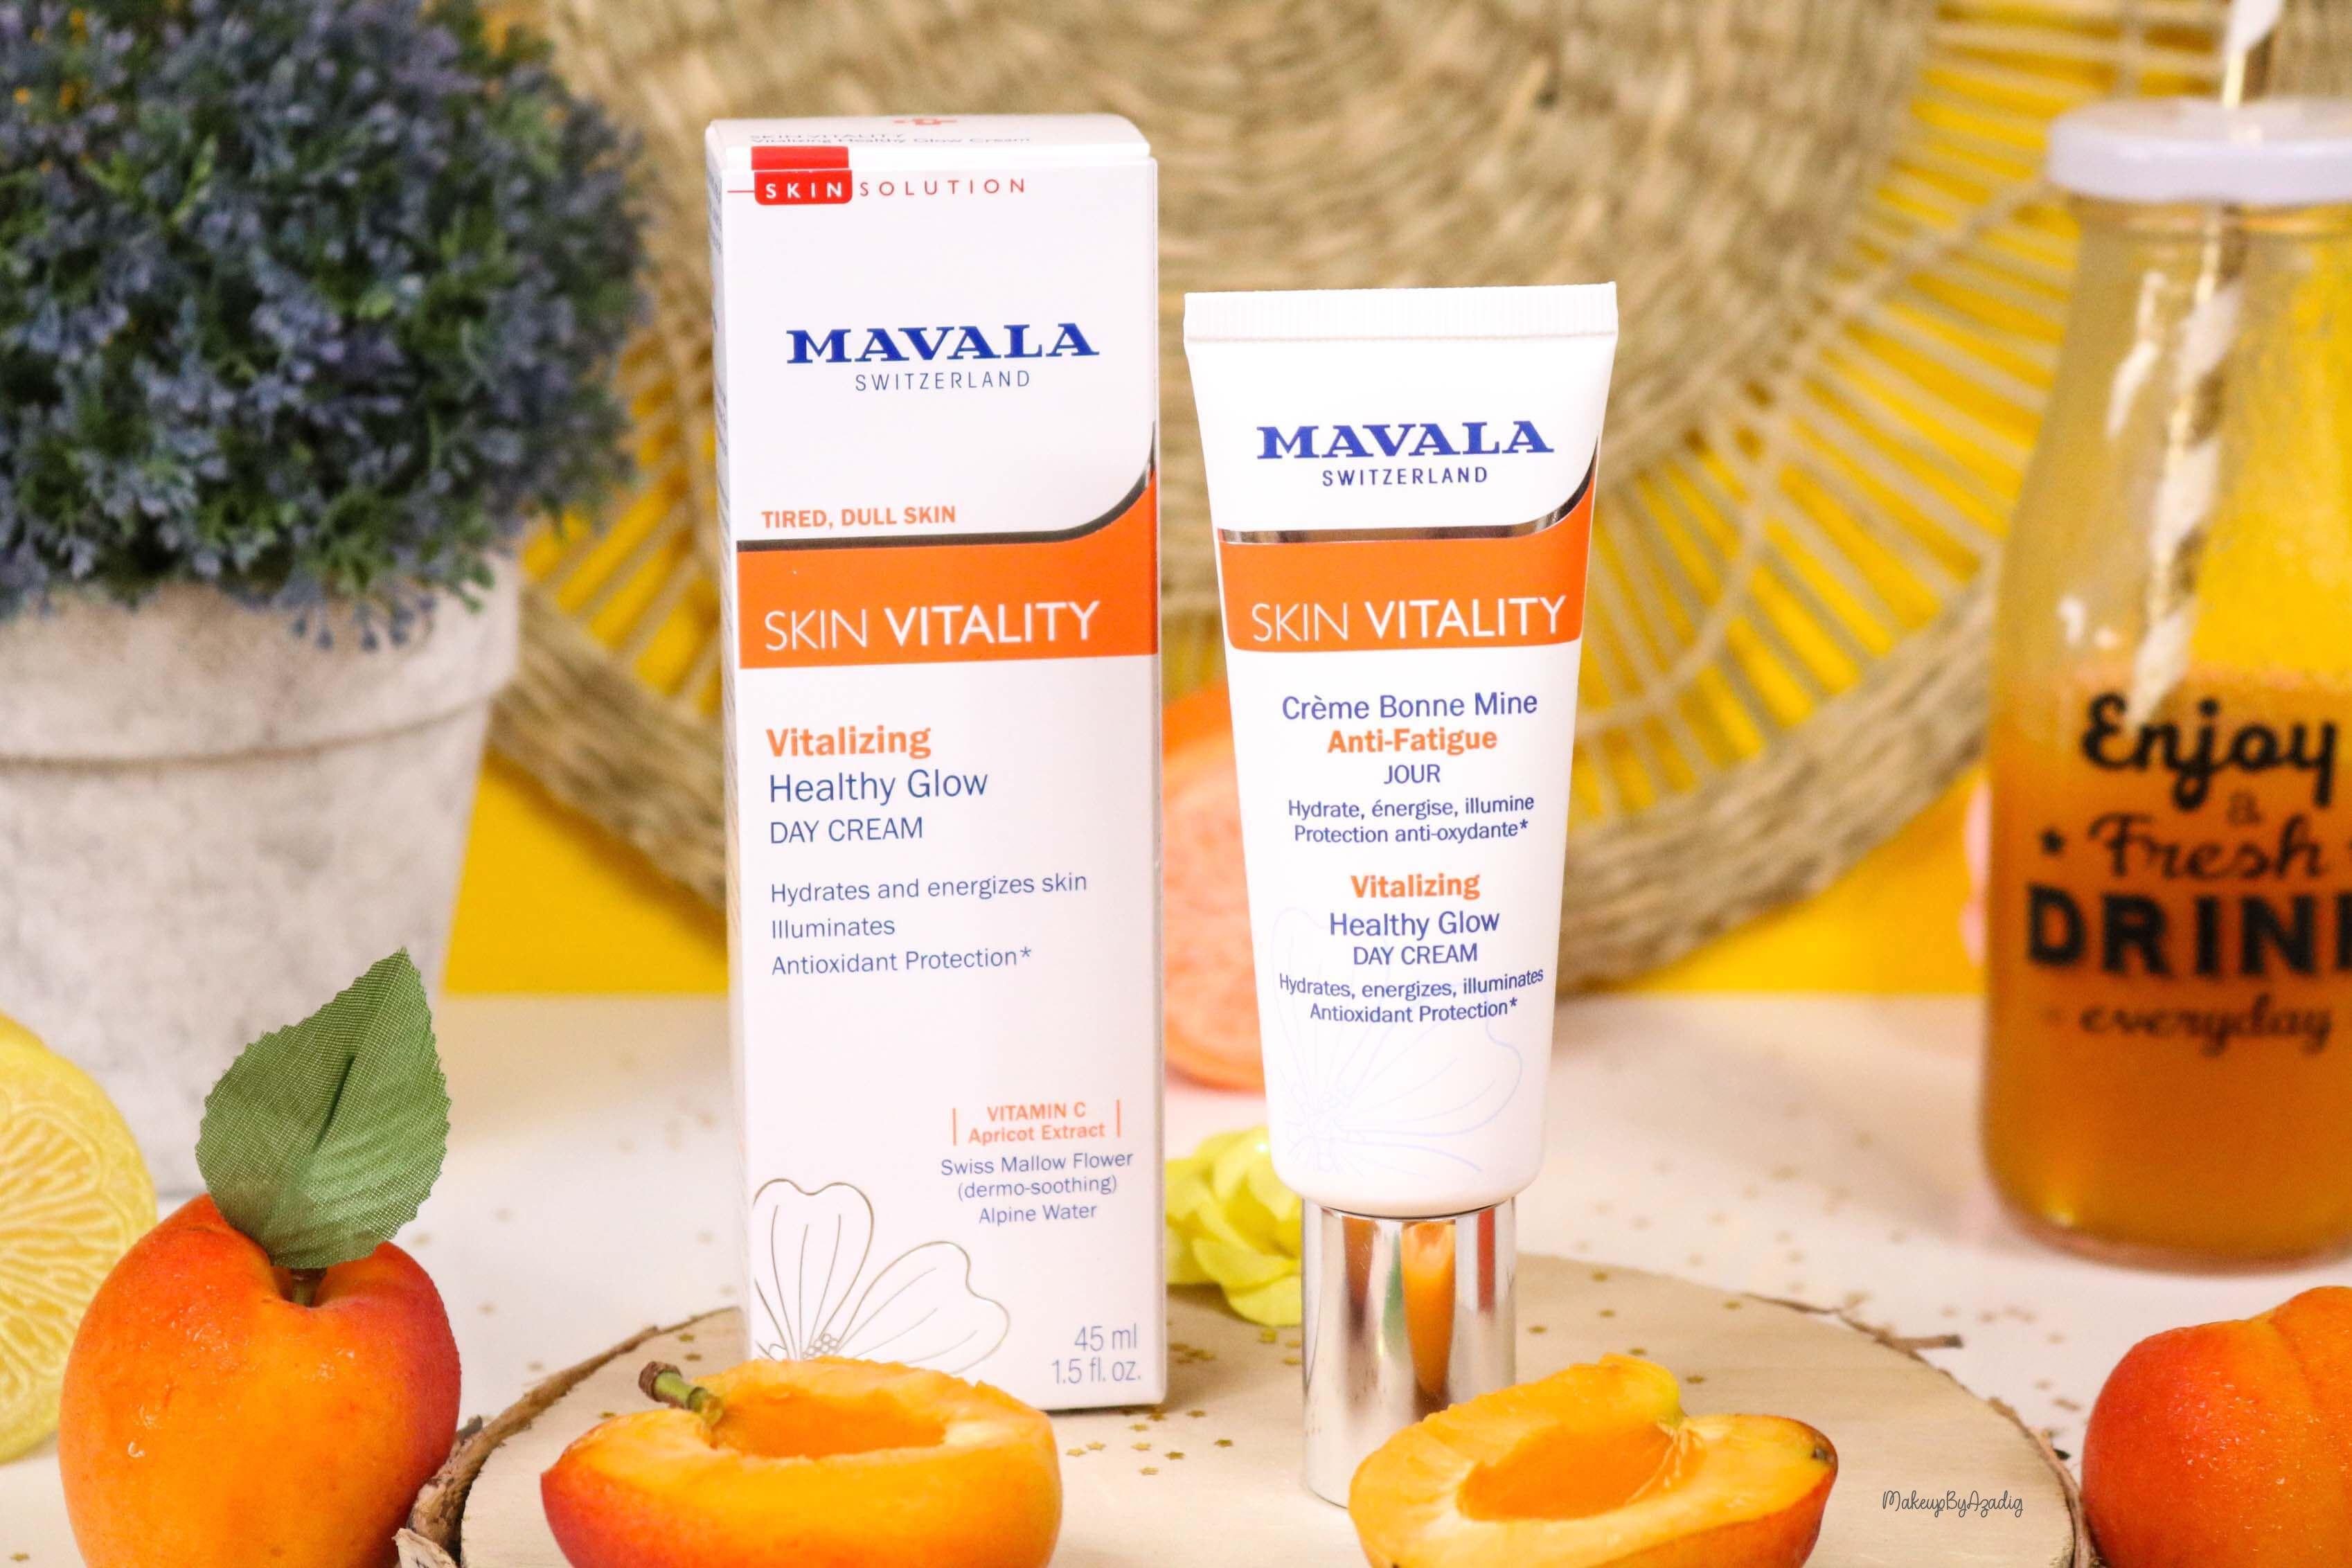 revue-routine-soin-bio-efficace-peau-sensible-skin-vitality-mavala-suisse-masque-nuit-serum-creme-jour-makeupbyazadig-anti-fatigue